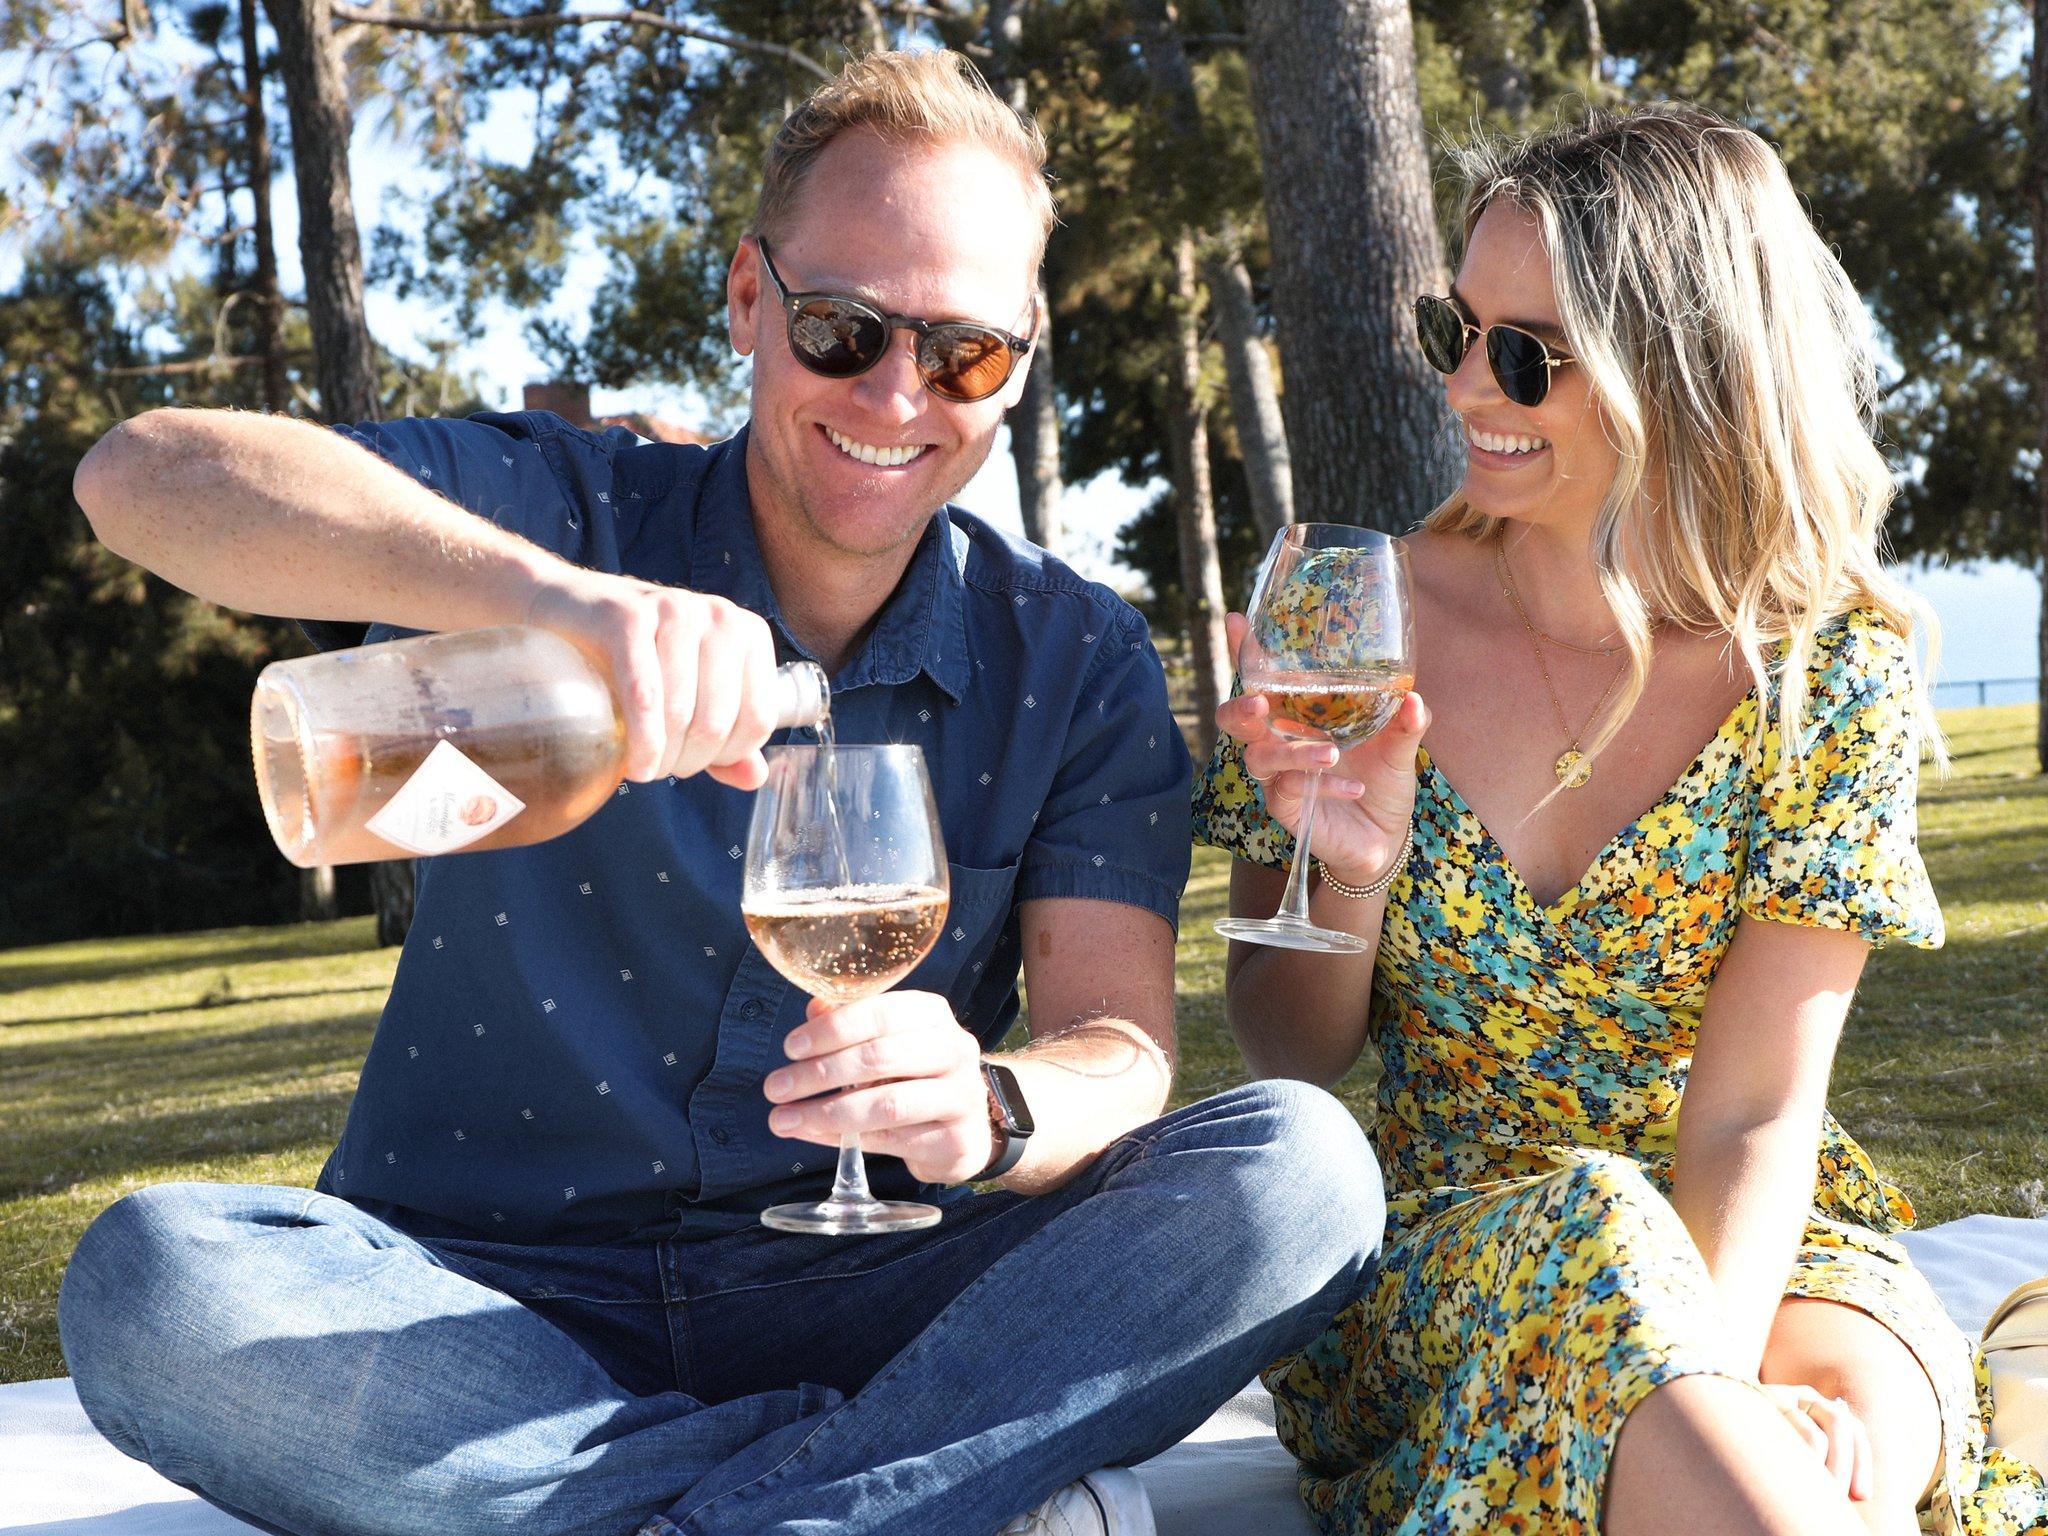 Man and woman having a picnic